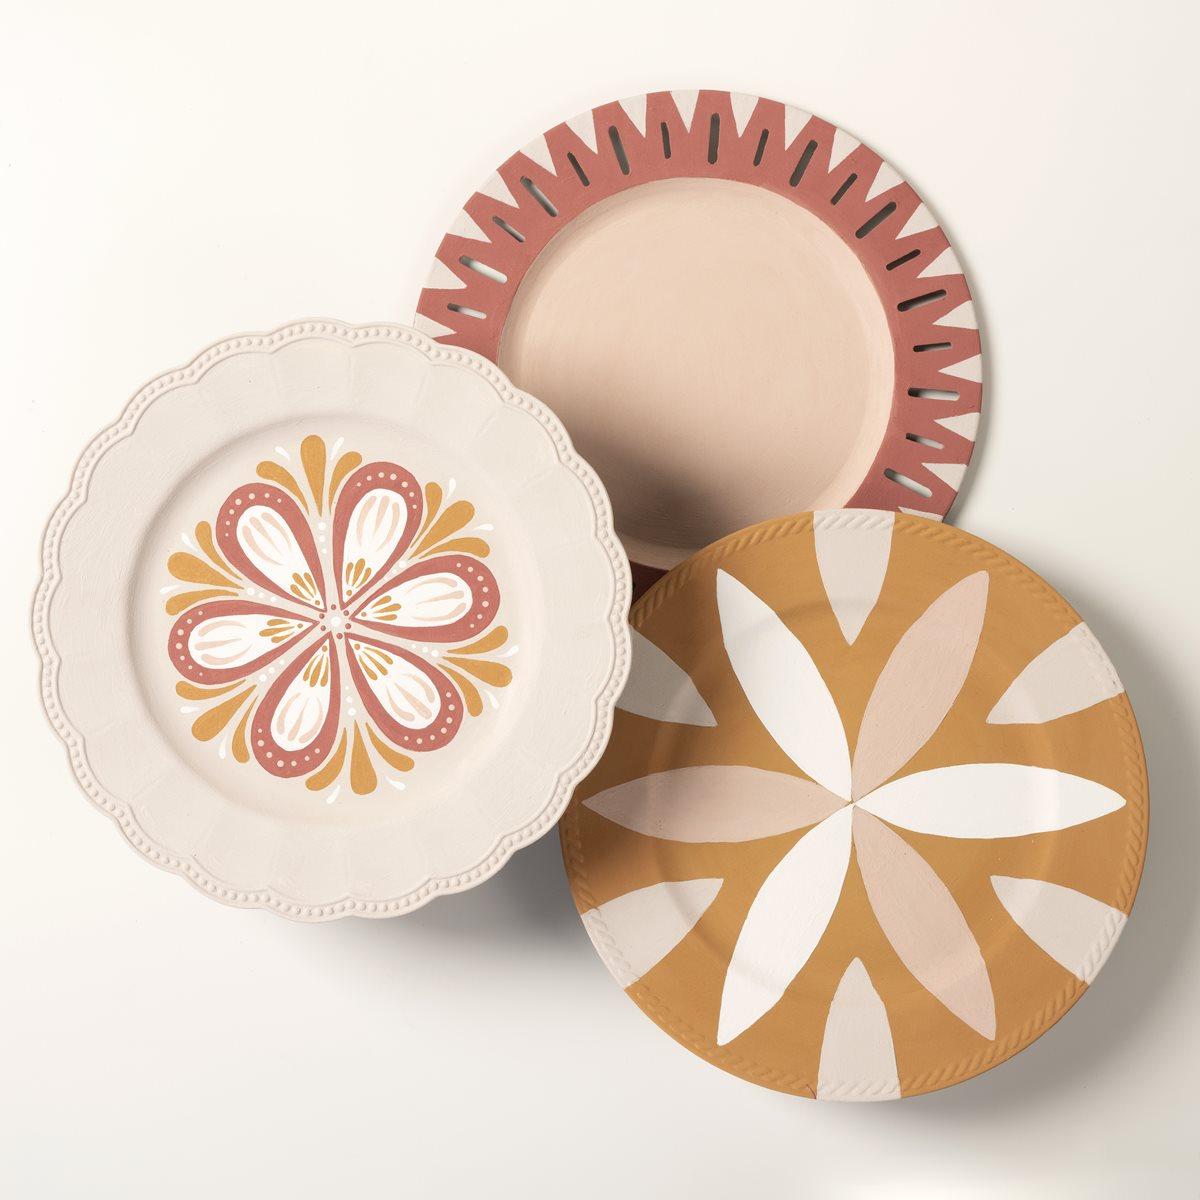 Terra Cotta Decorative Plates